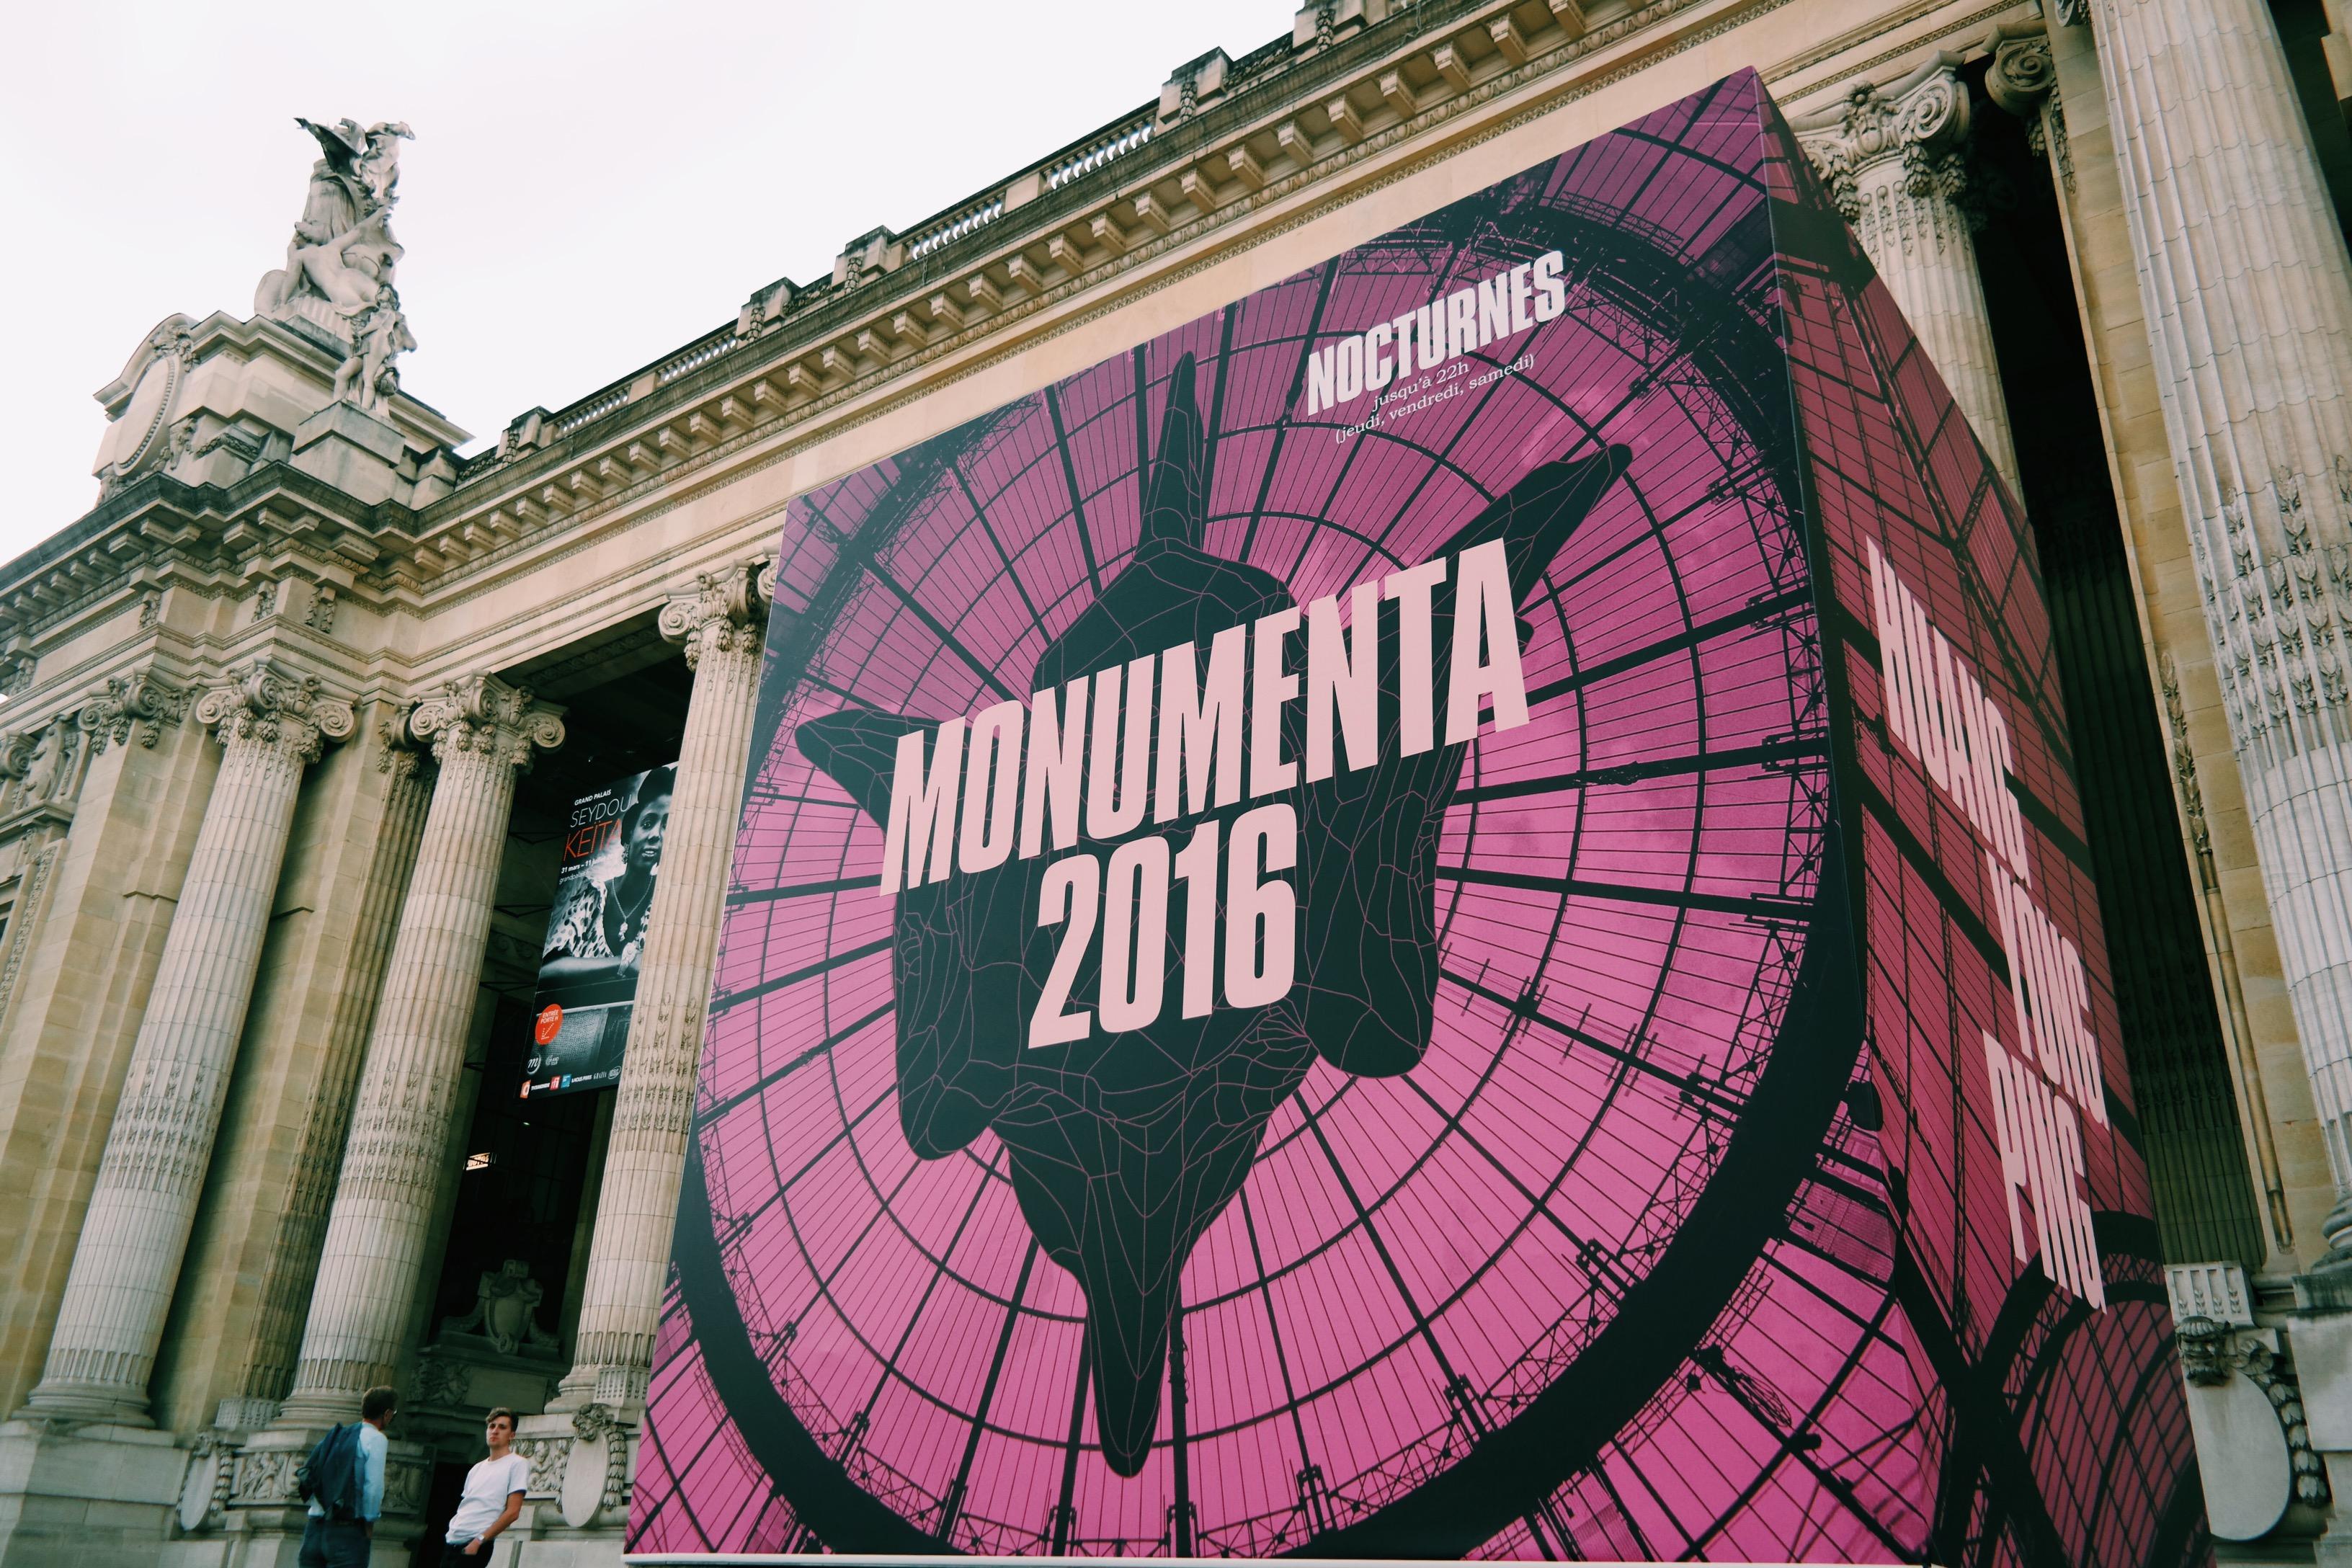 Monumenta-2016-Empires-Huang-Yong-Ping-Grand-Palais-Paris-affiche-entrée-Nef-Kamel-Mennour-photo-usofparis-blog